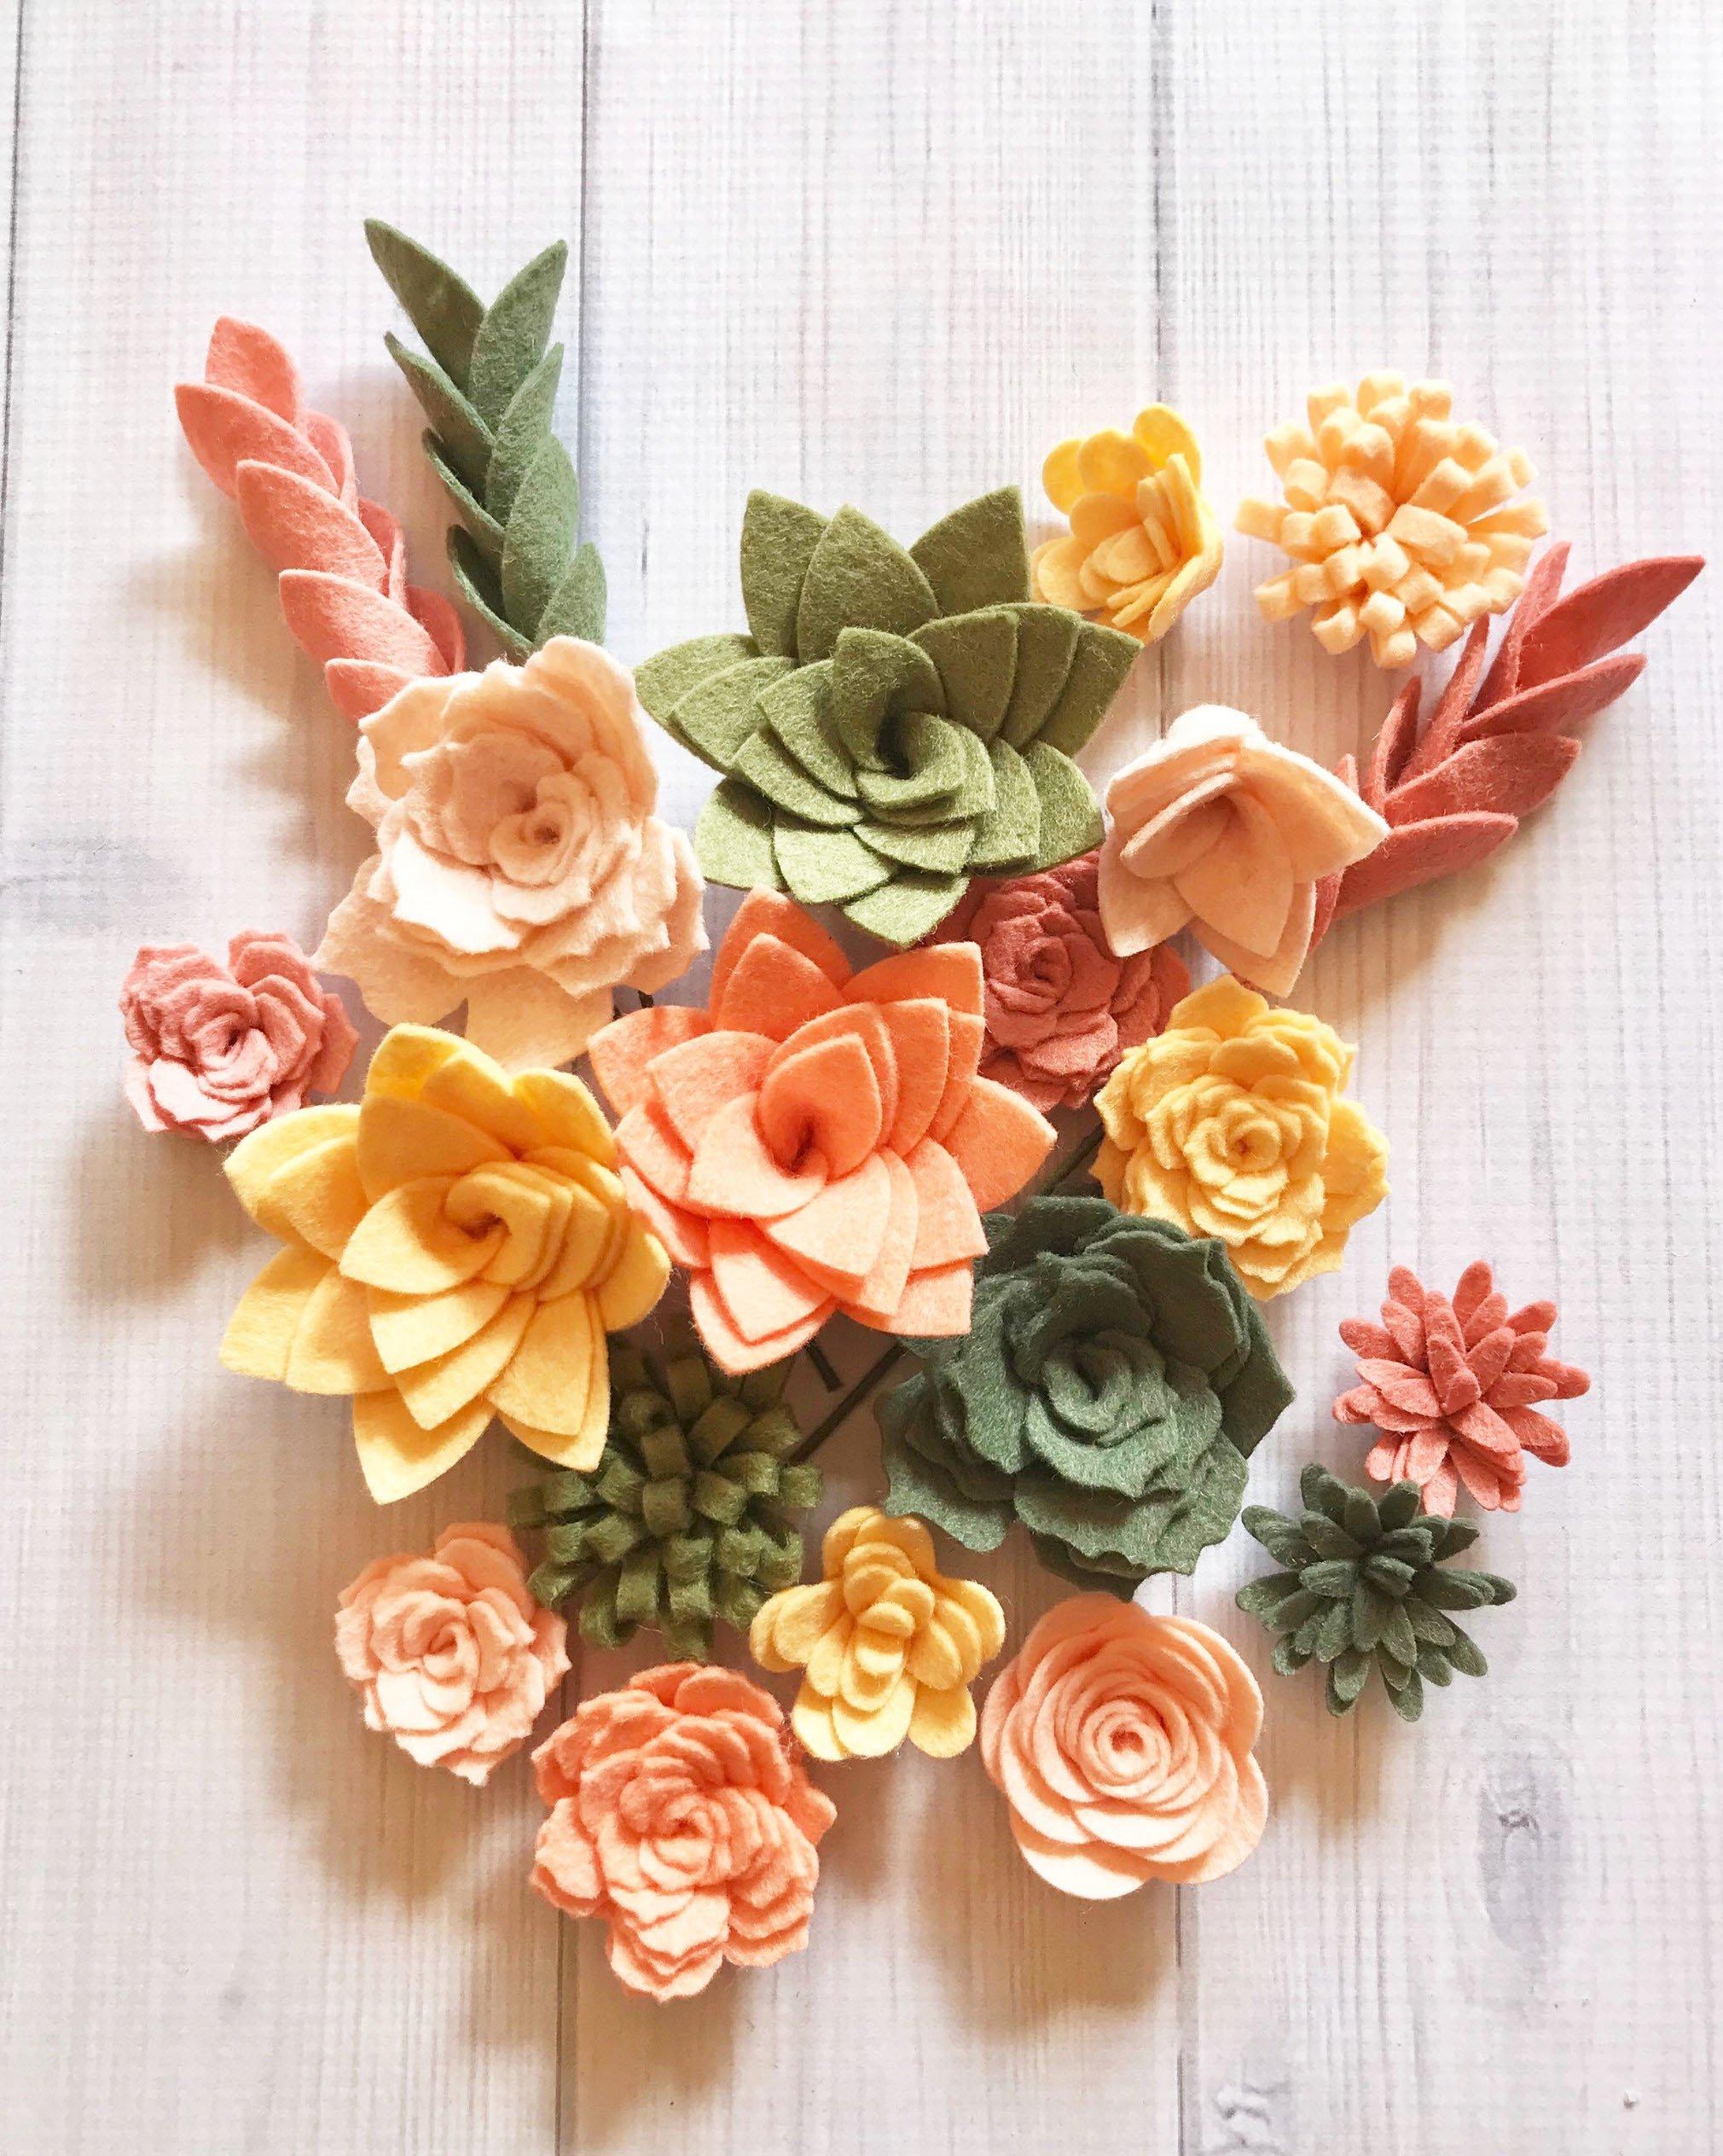 Wool-Felt-Succulents-and-Felt-Flowers-Spring-Blush-Pink-Coral-Create-Headbands-DIY-Wreaths-Garland-Vertical-Garden-Baby-Shower-Wedding